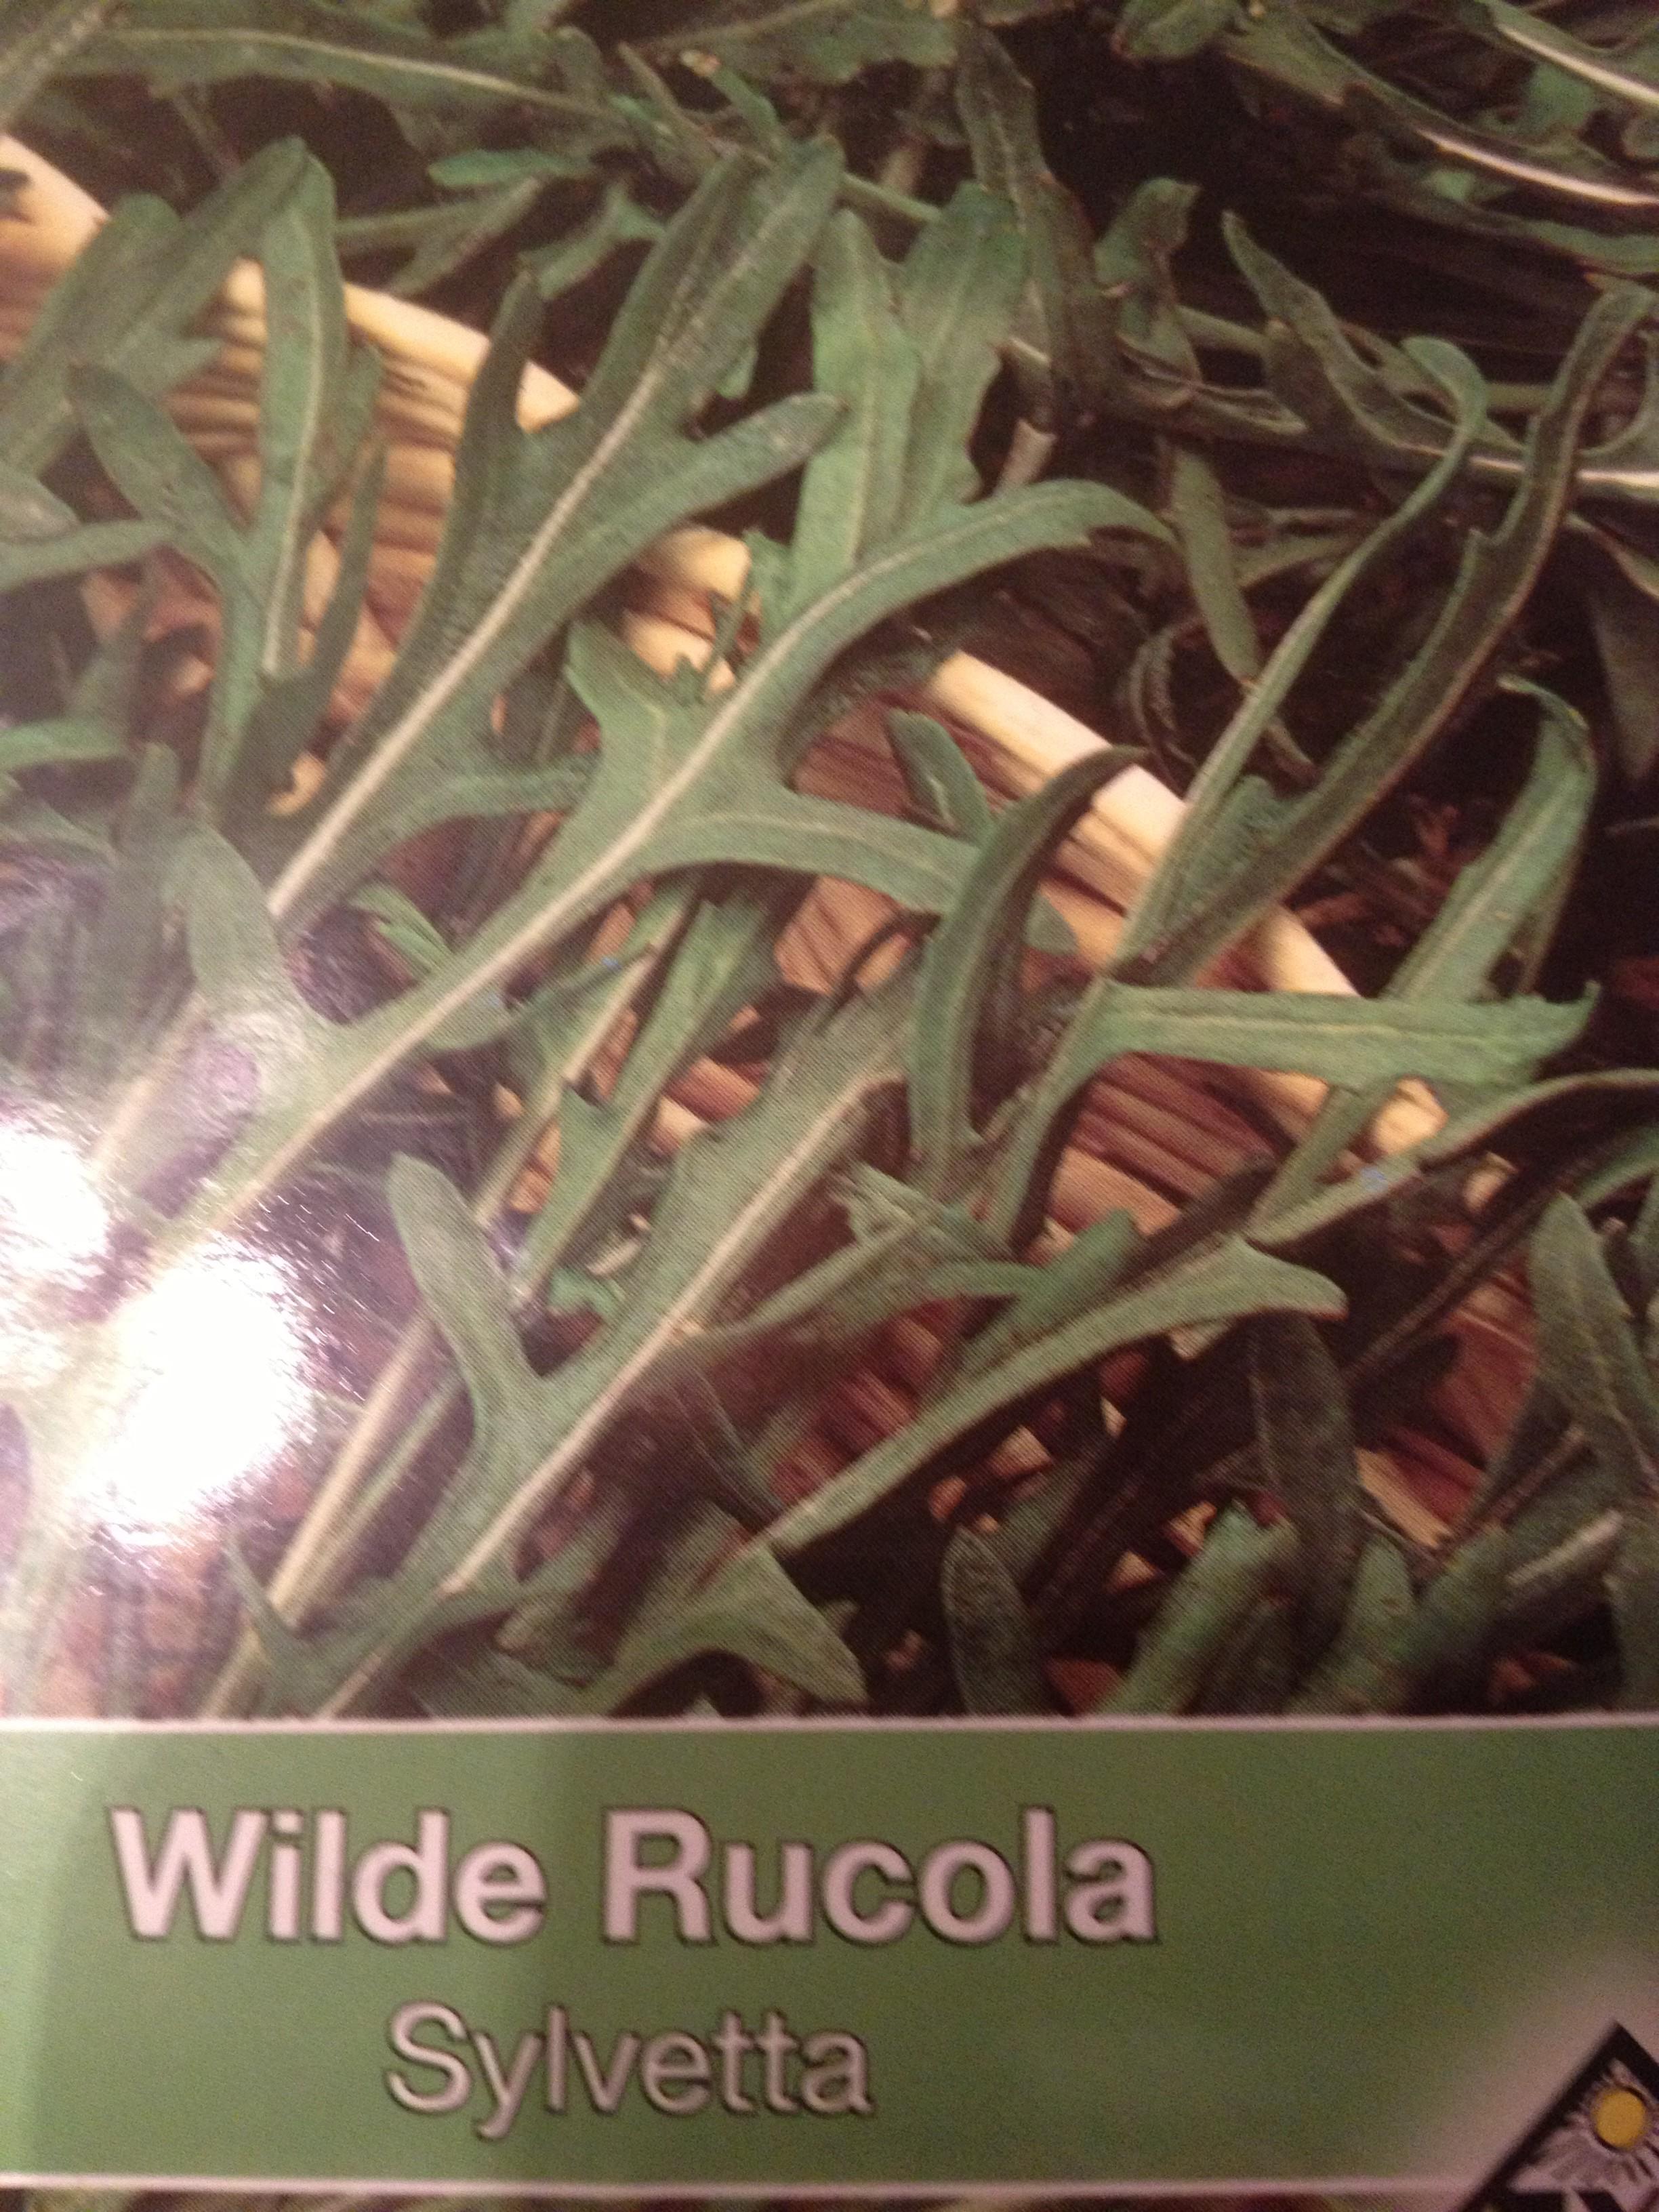 rucola wilde